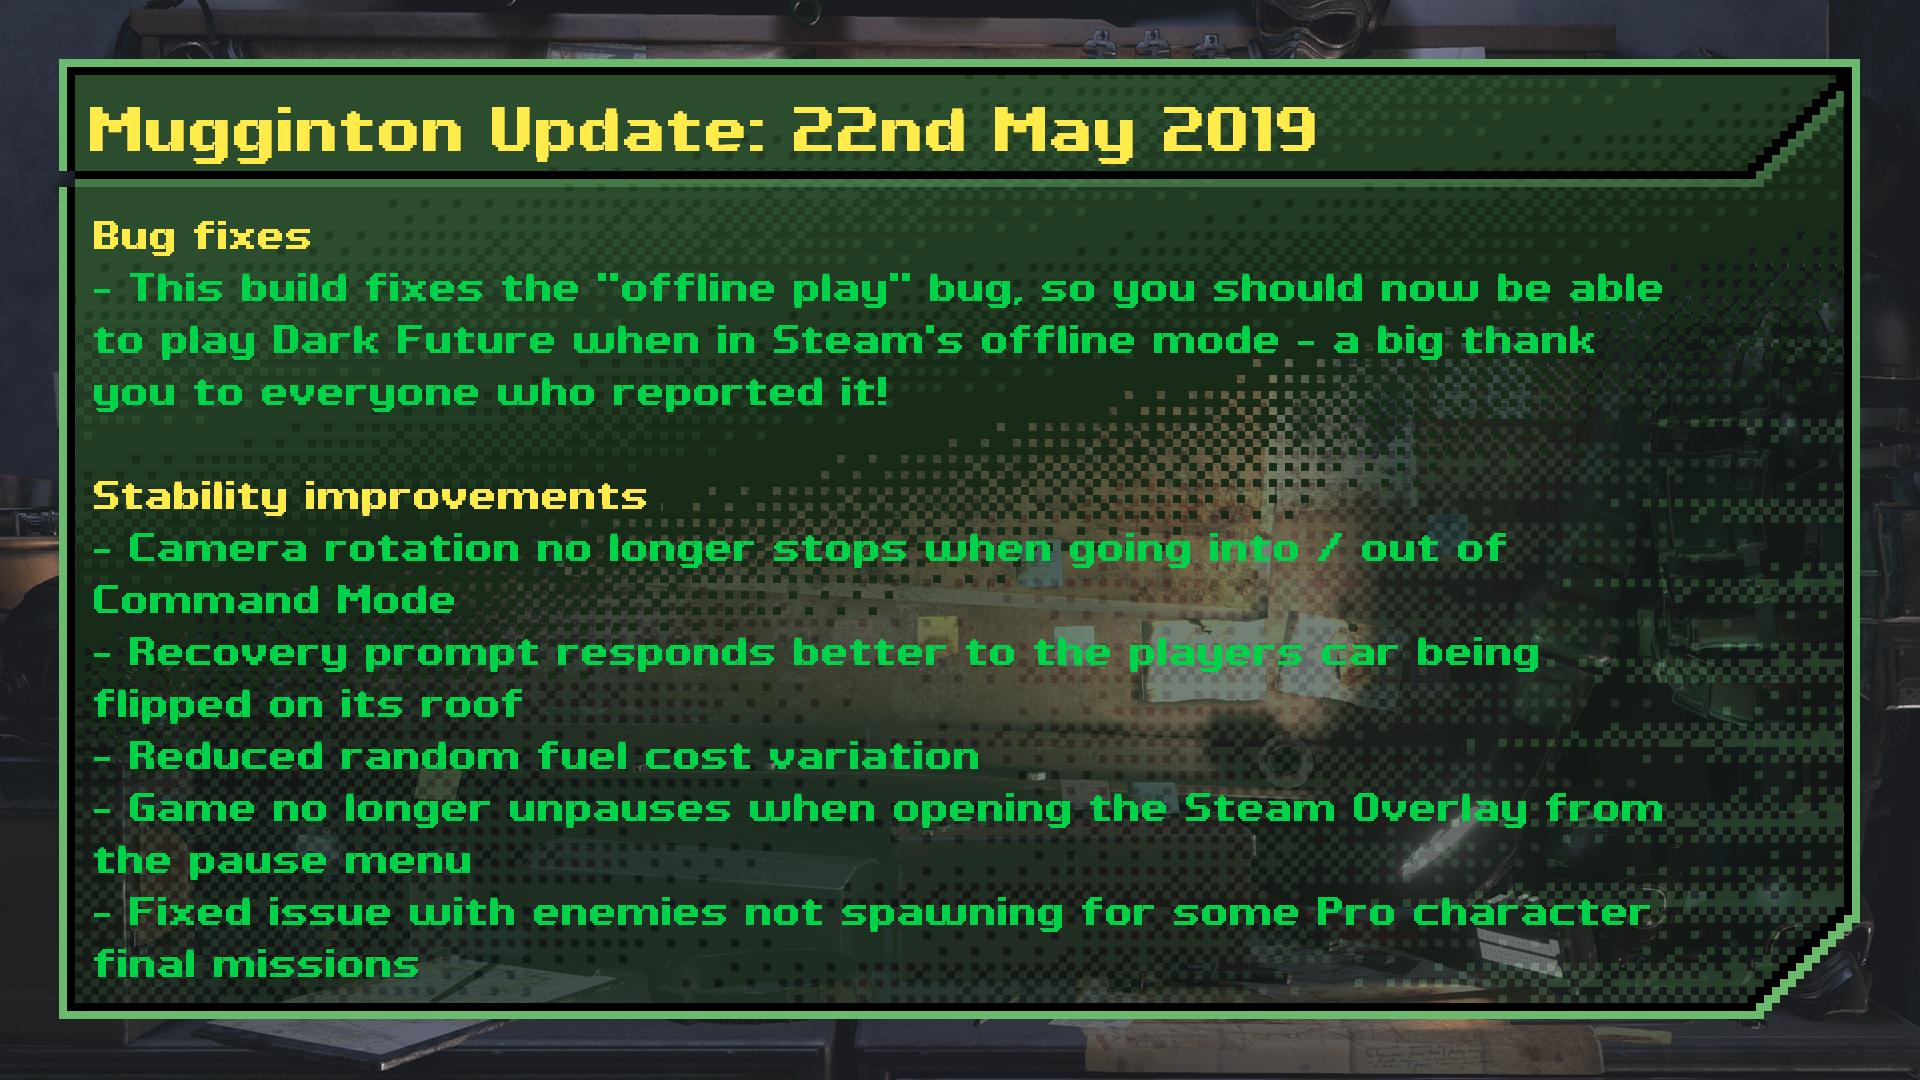 News - All News